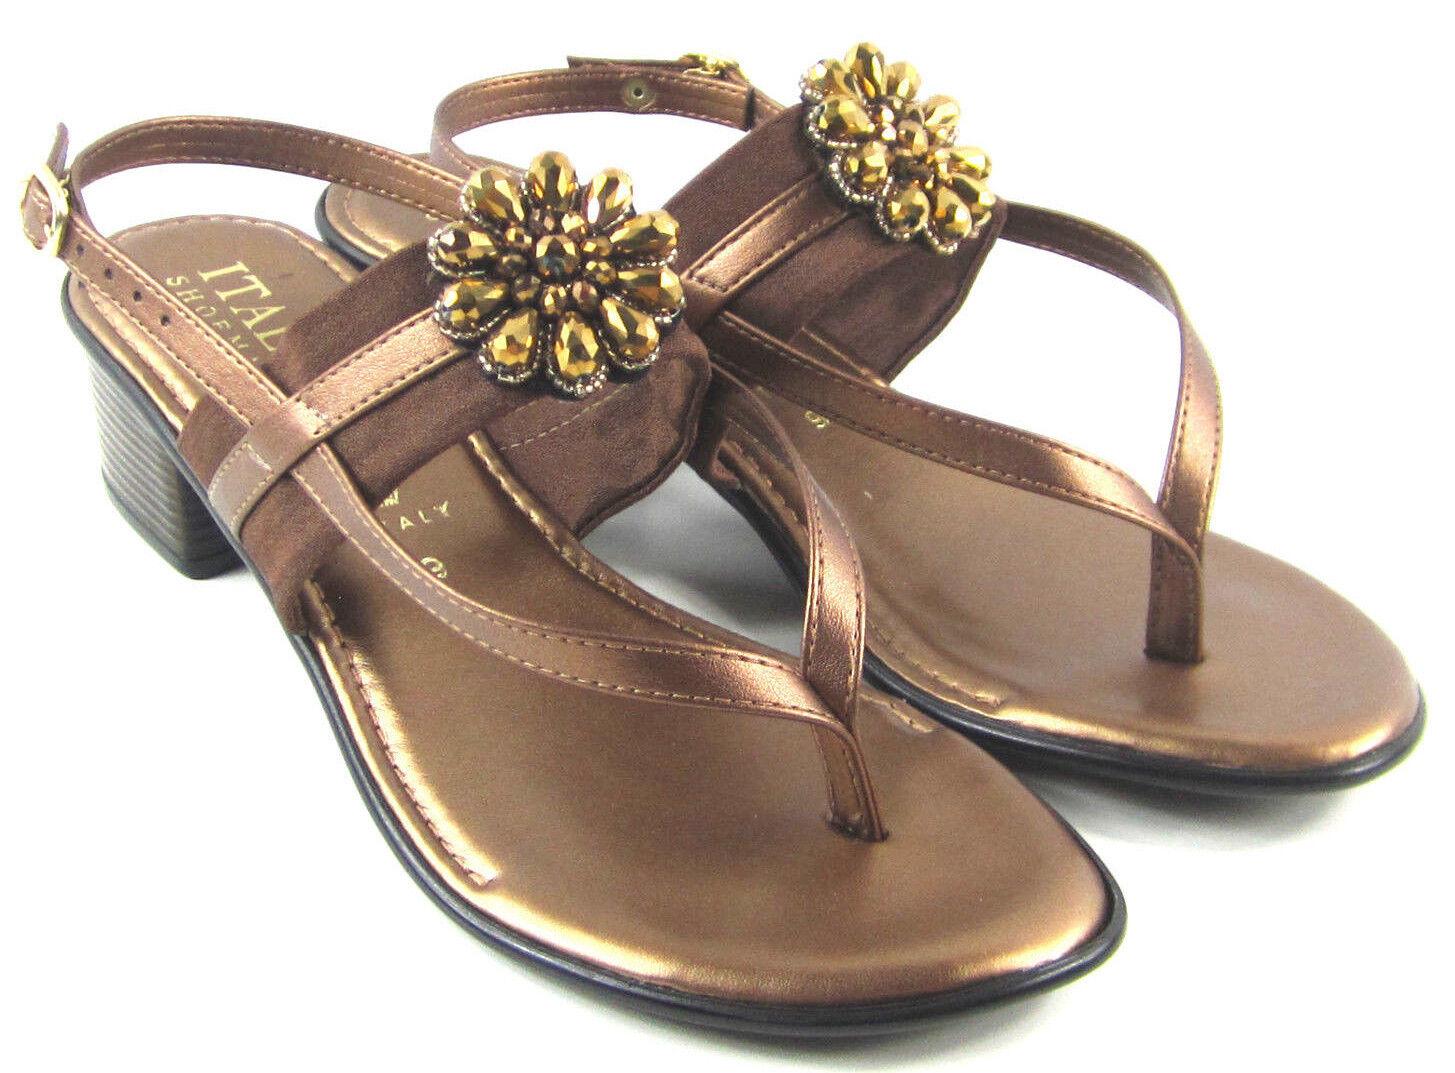 abd0710a3 Italian Shoemakers Lovely Bronze Metal Rhinestone Sandals Womens Sz ...